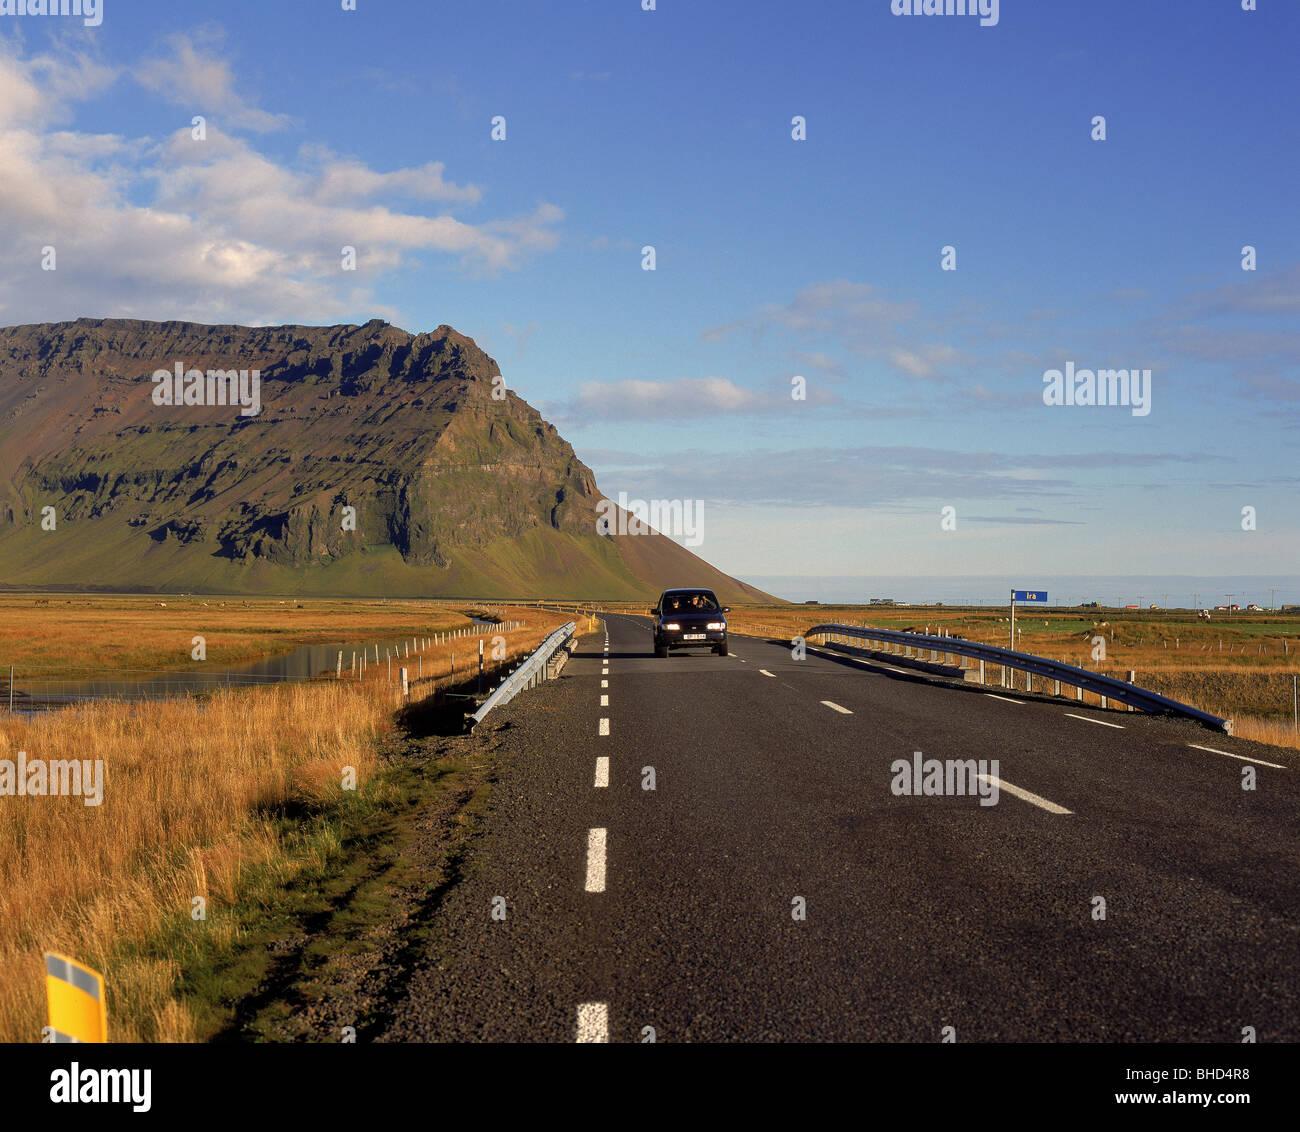 La conduite sur route 1 par zone, l'Islande Eyjafjoll Photo Stock